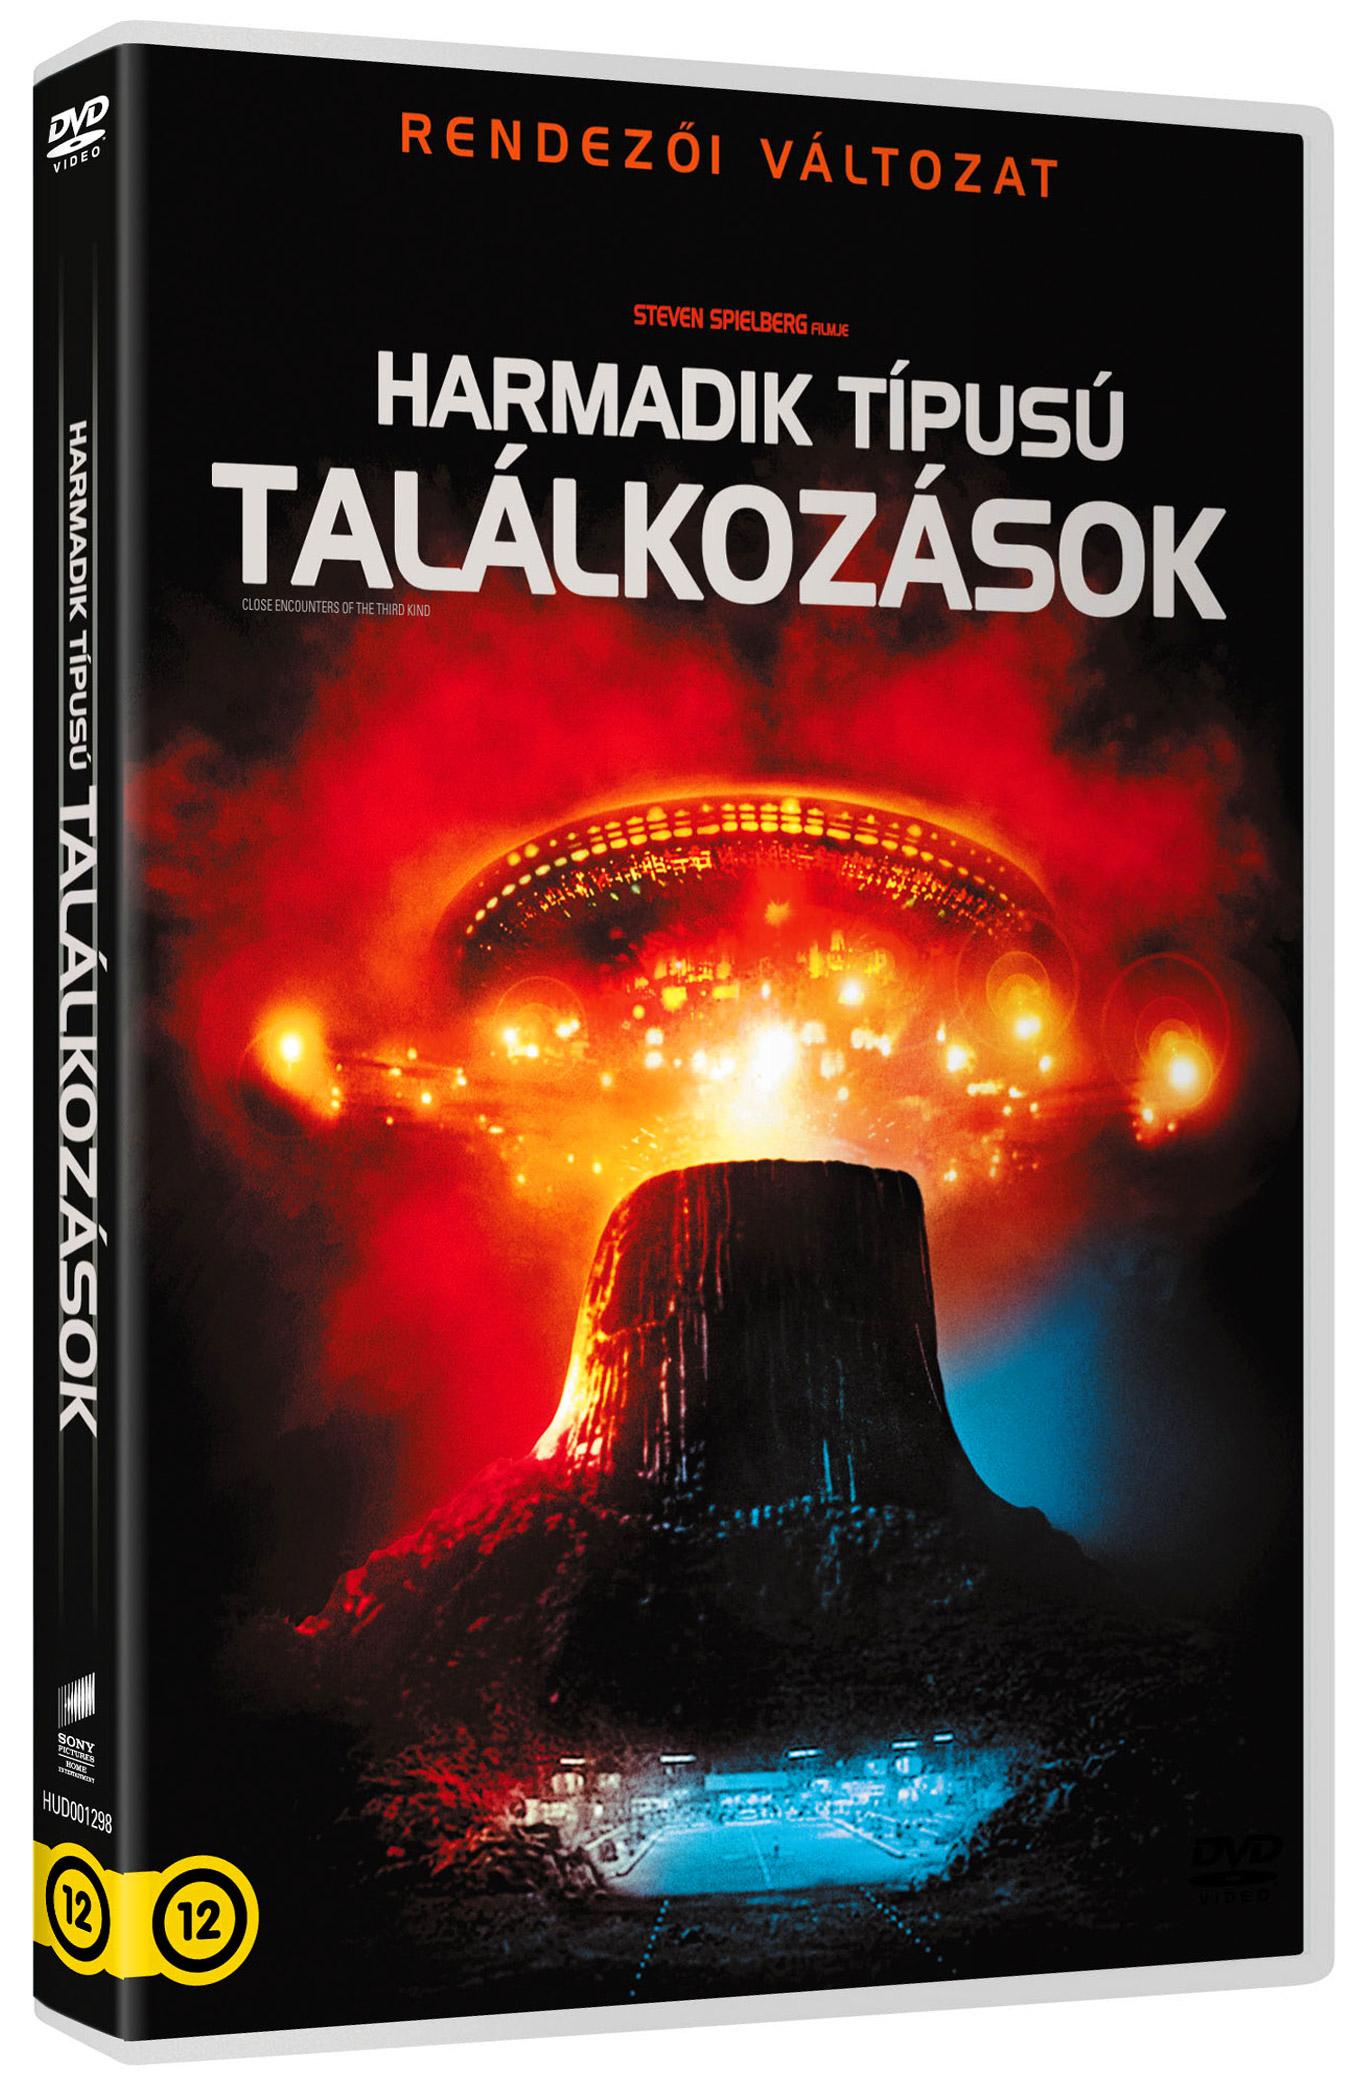 Harmadik t�pus� tal�lkoz�sok (rendez�i v�ltozat) DVD